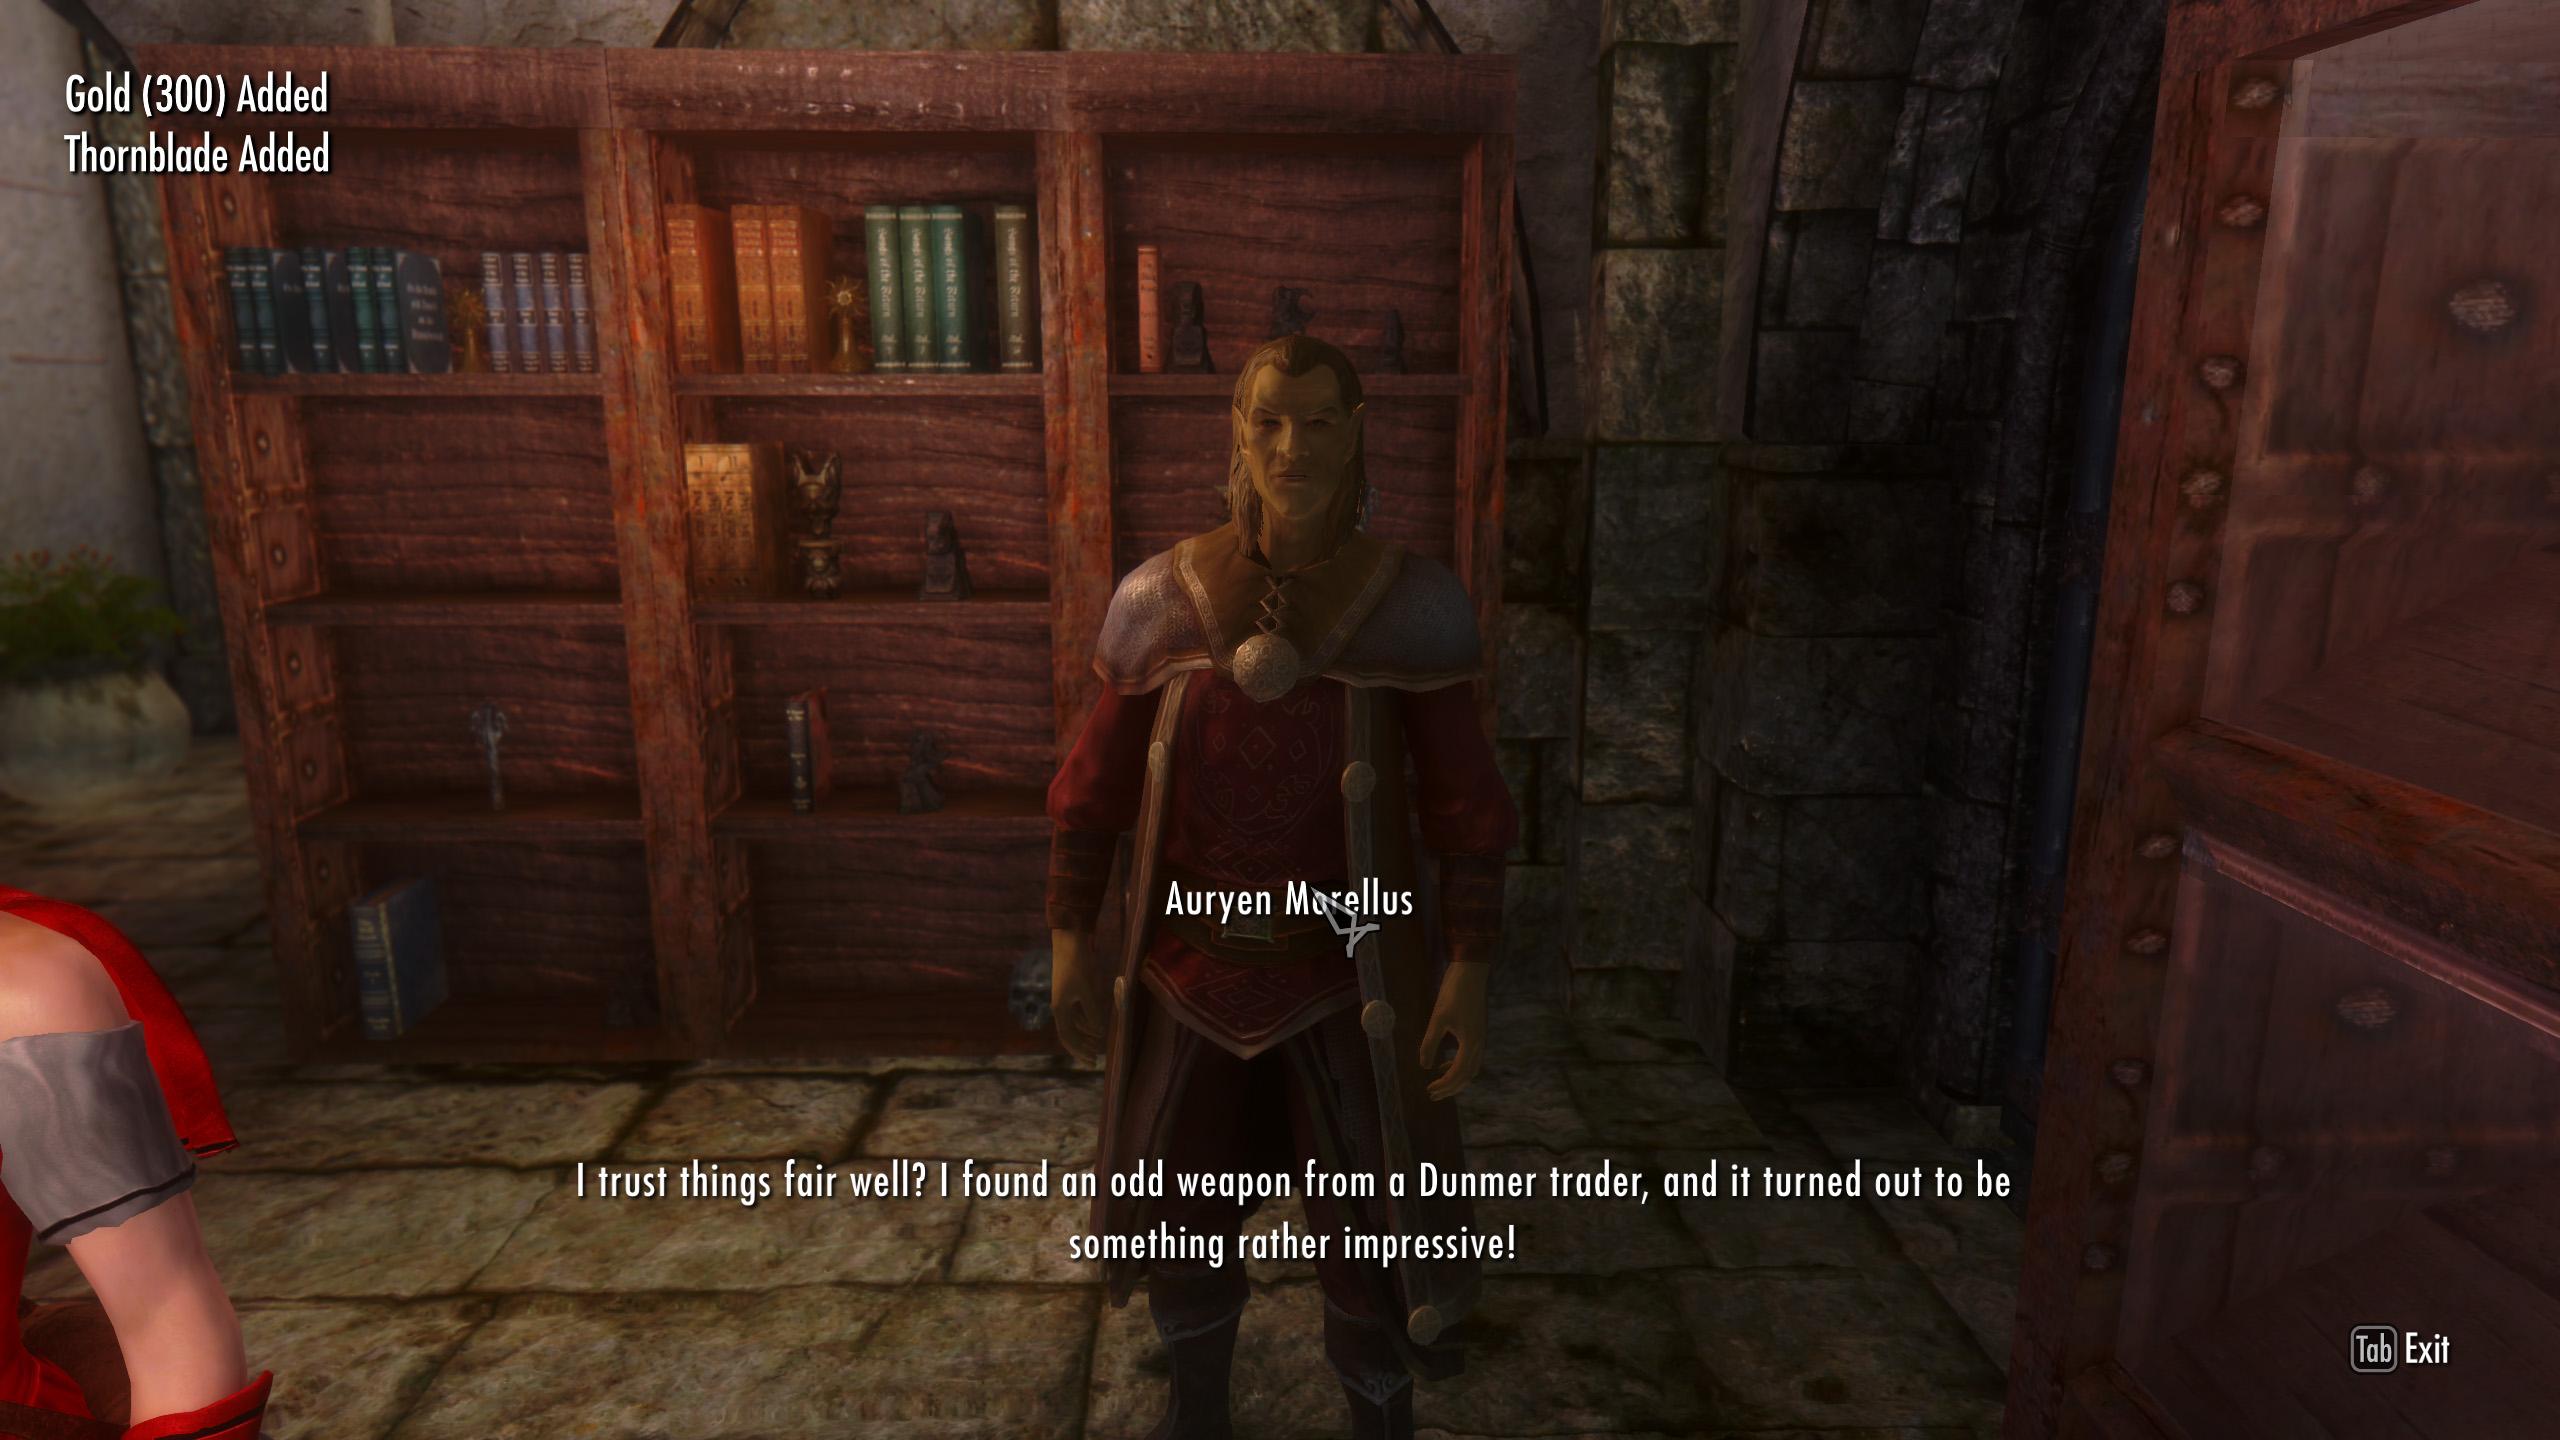 Mod Spotlight: Skyrim's Legacy of the Dragonborn Mod